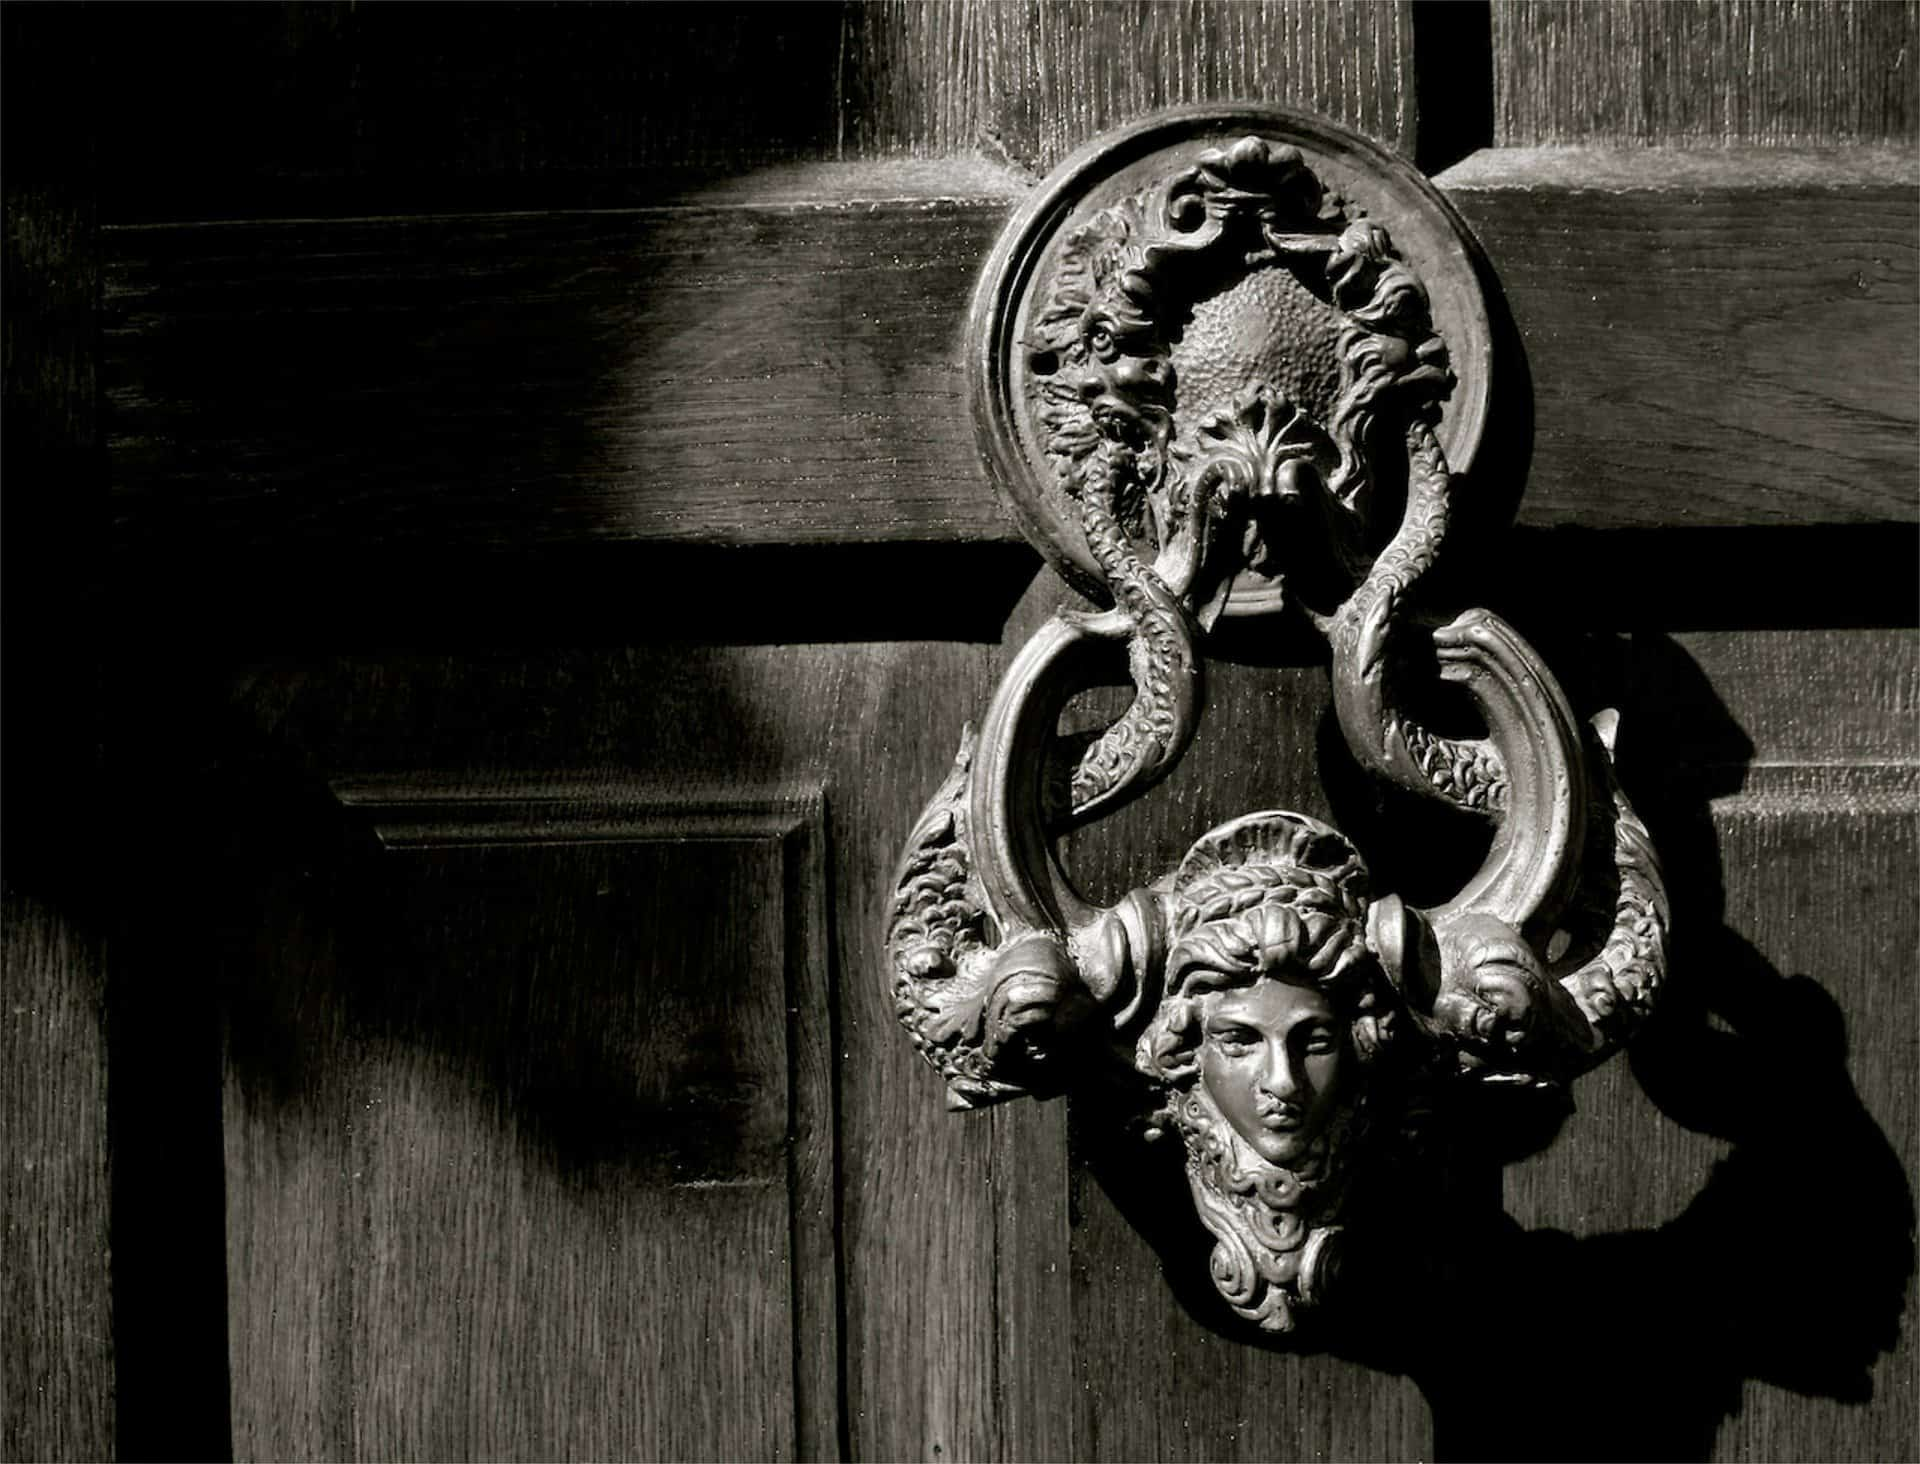 Dacre SToker Puerta